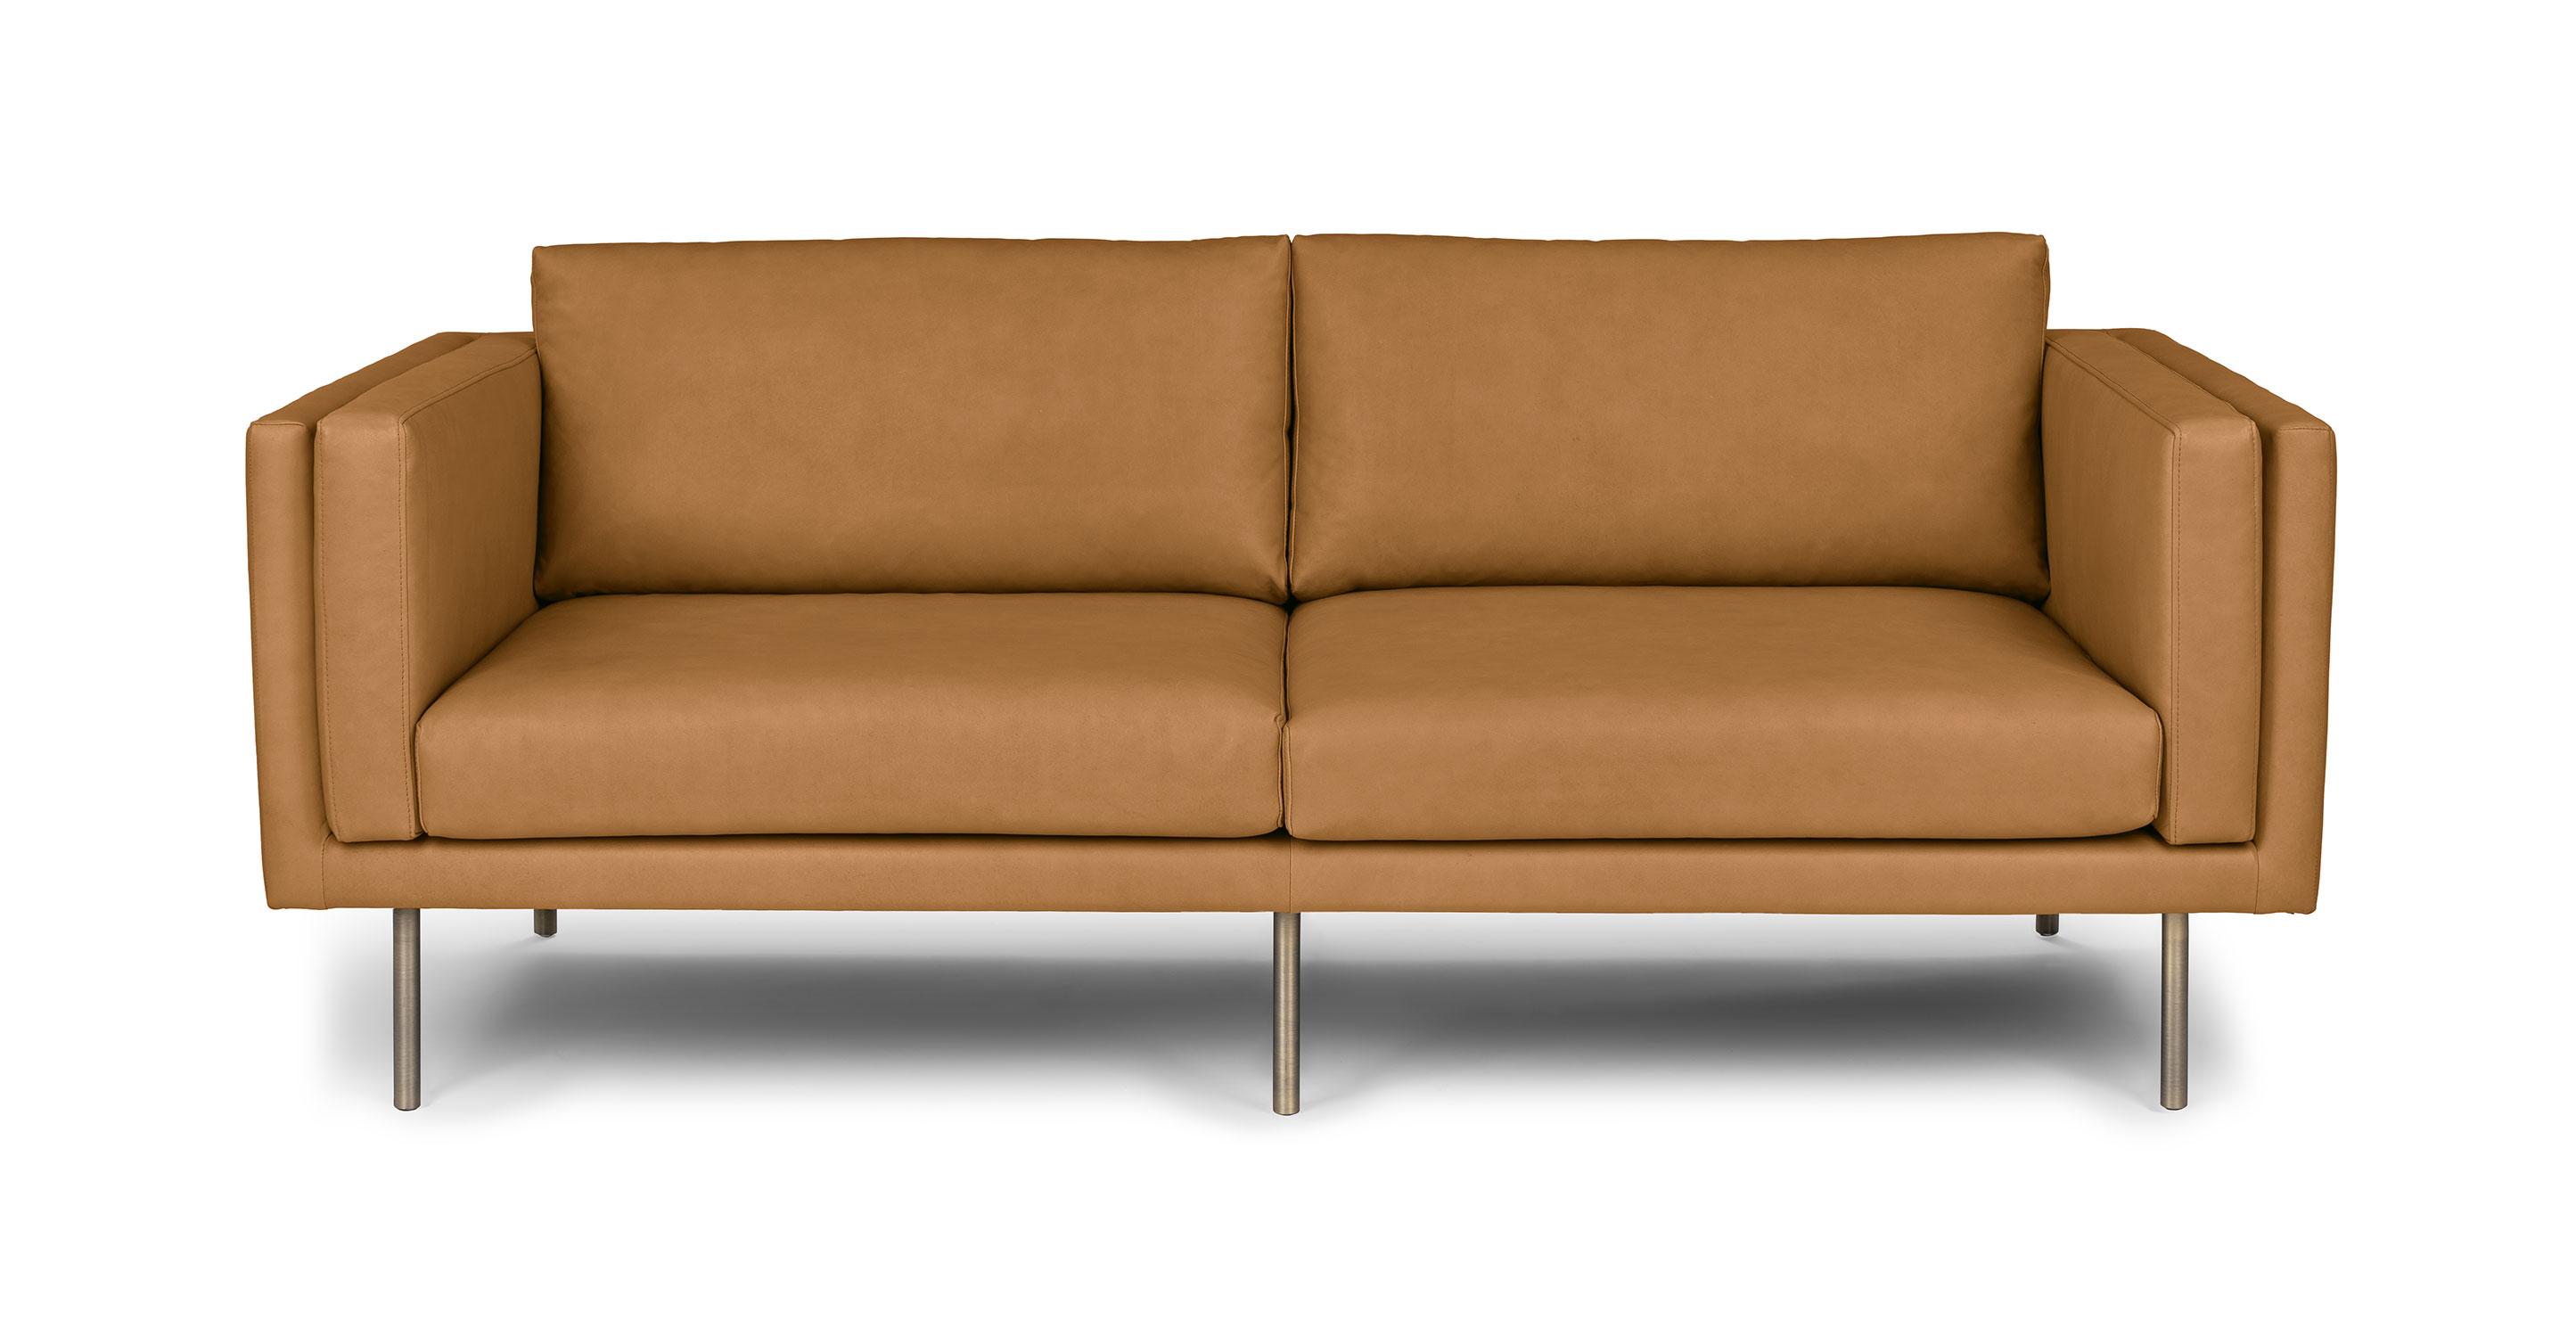 wooden sofa legs canada ottoman bed harvey norman belez yuma tan 73